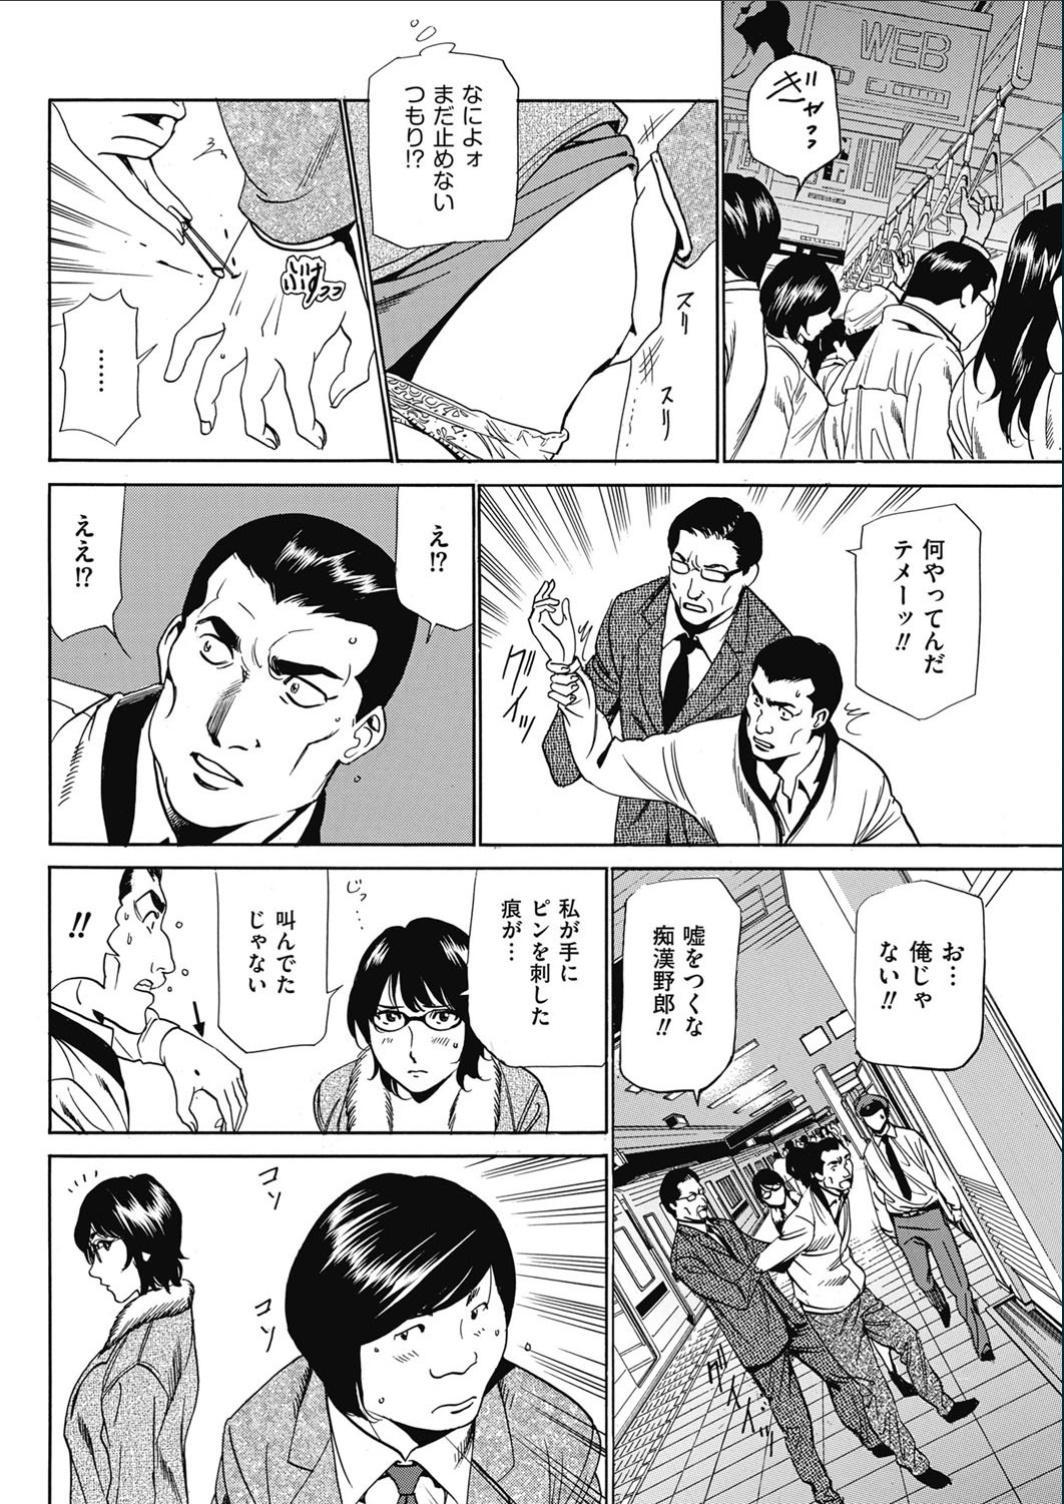 Wa Usuki Ipa a 1-10 94